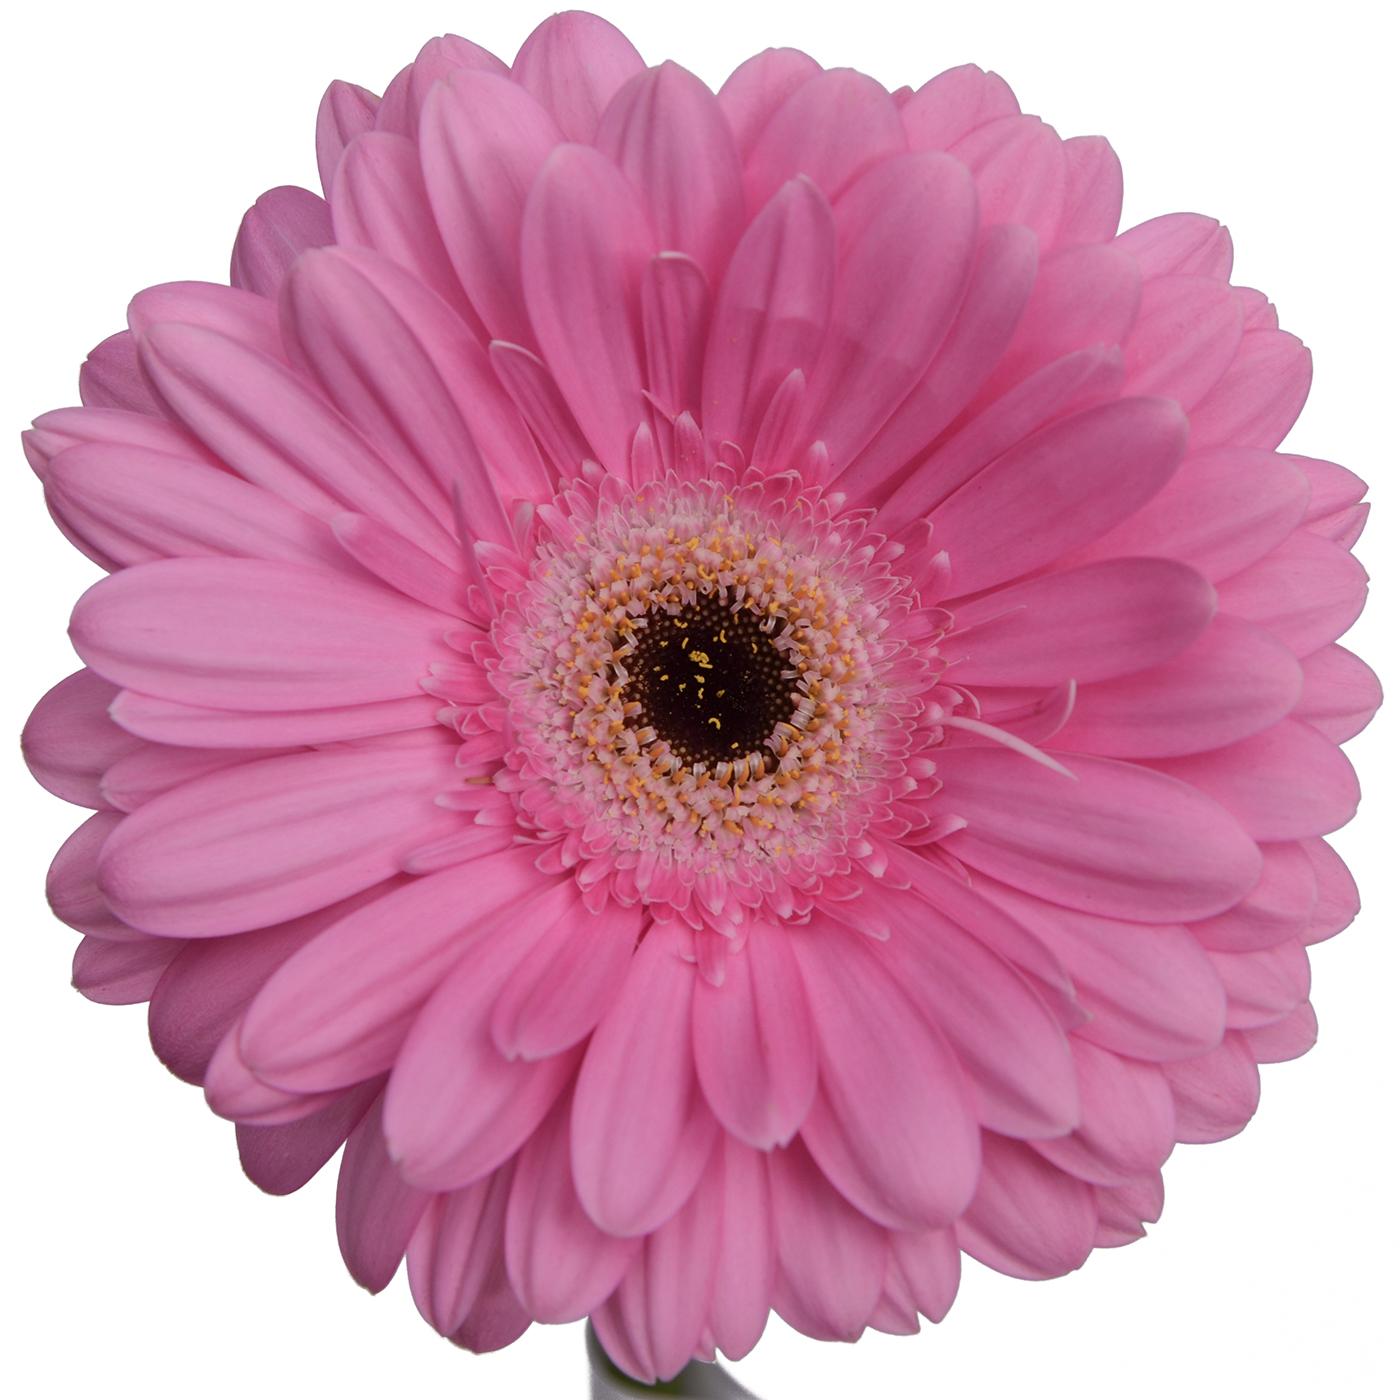 Gerbera Daisy Pink Dark Center Pick Up Flower Catalog